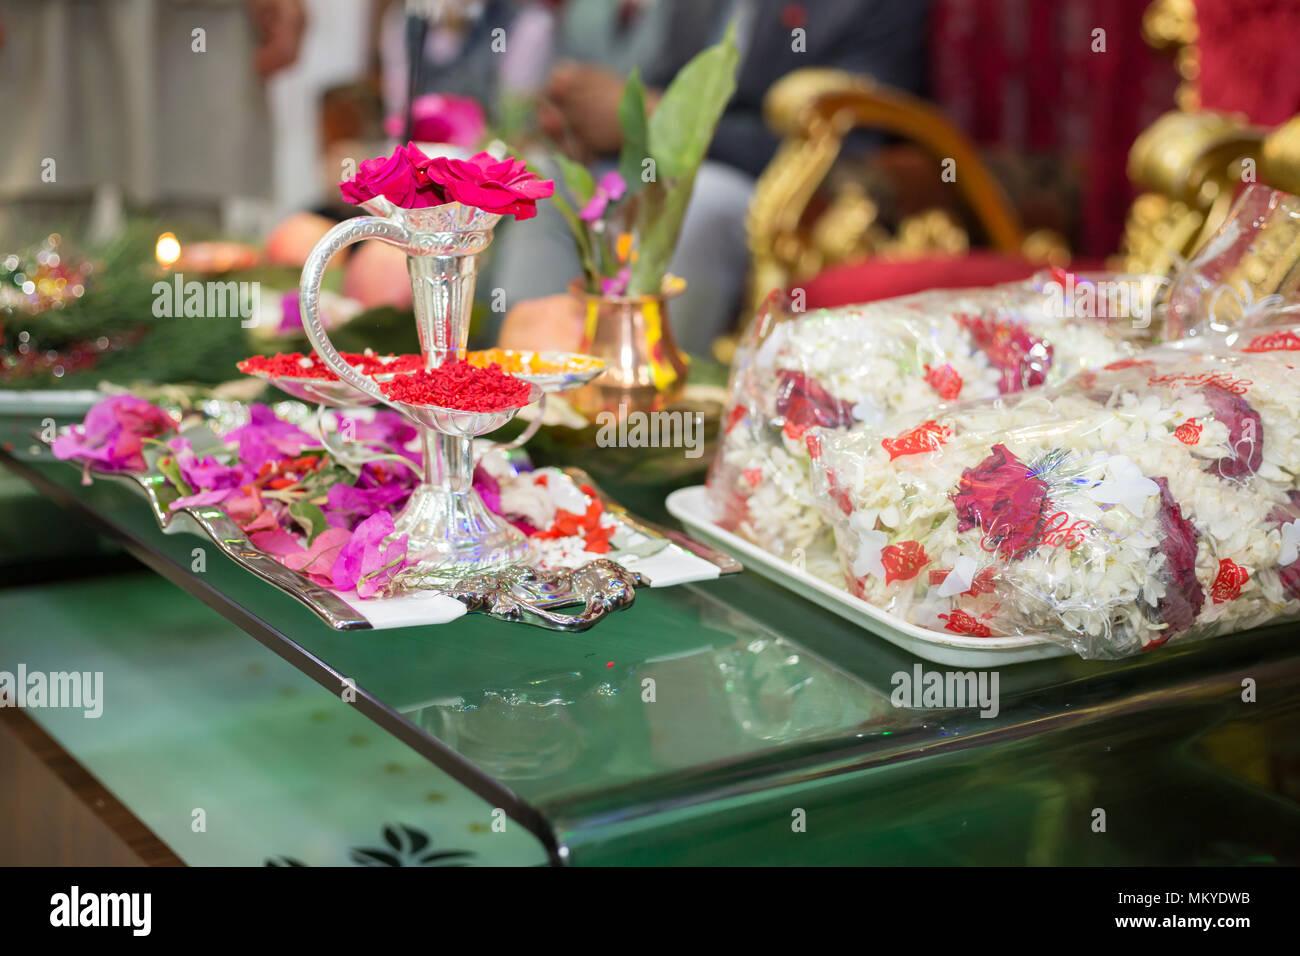 Flowersholy leavesmoney and other accessories at the hindu wedding flowersholy leavesmoney and other accessories at the hindu wedding ceremony in kathmandu nepal junglespirit Gallery